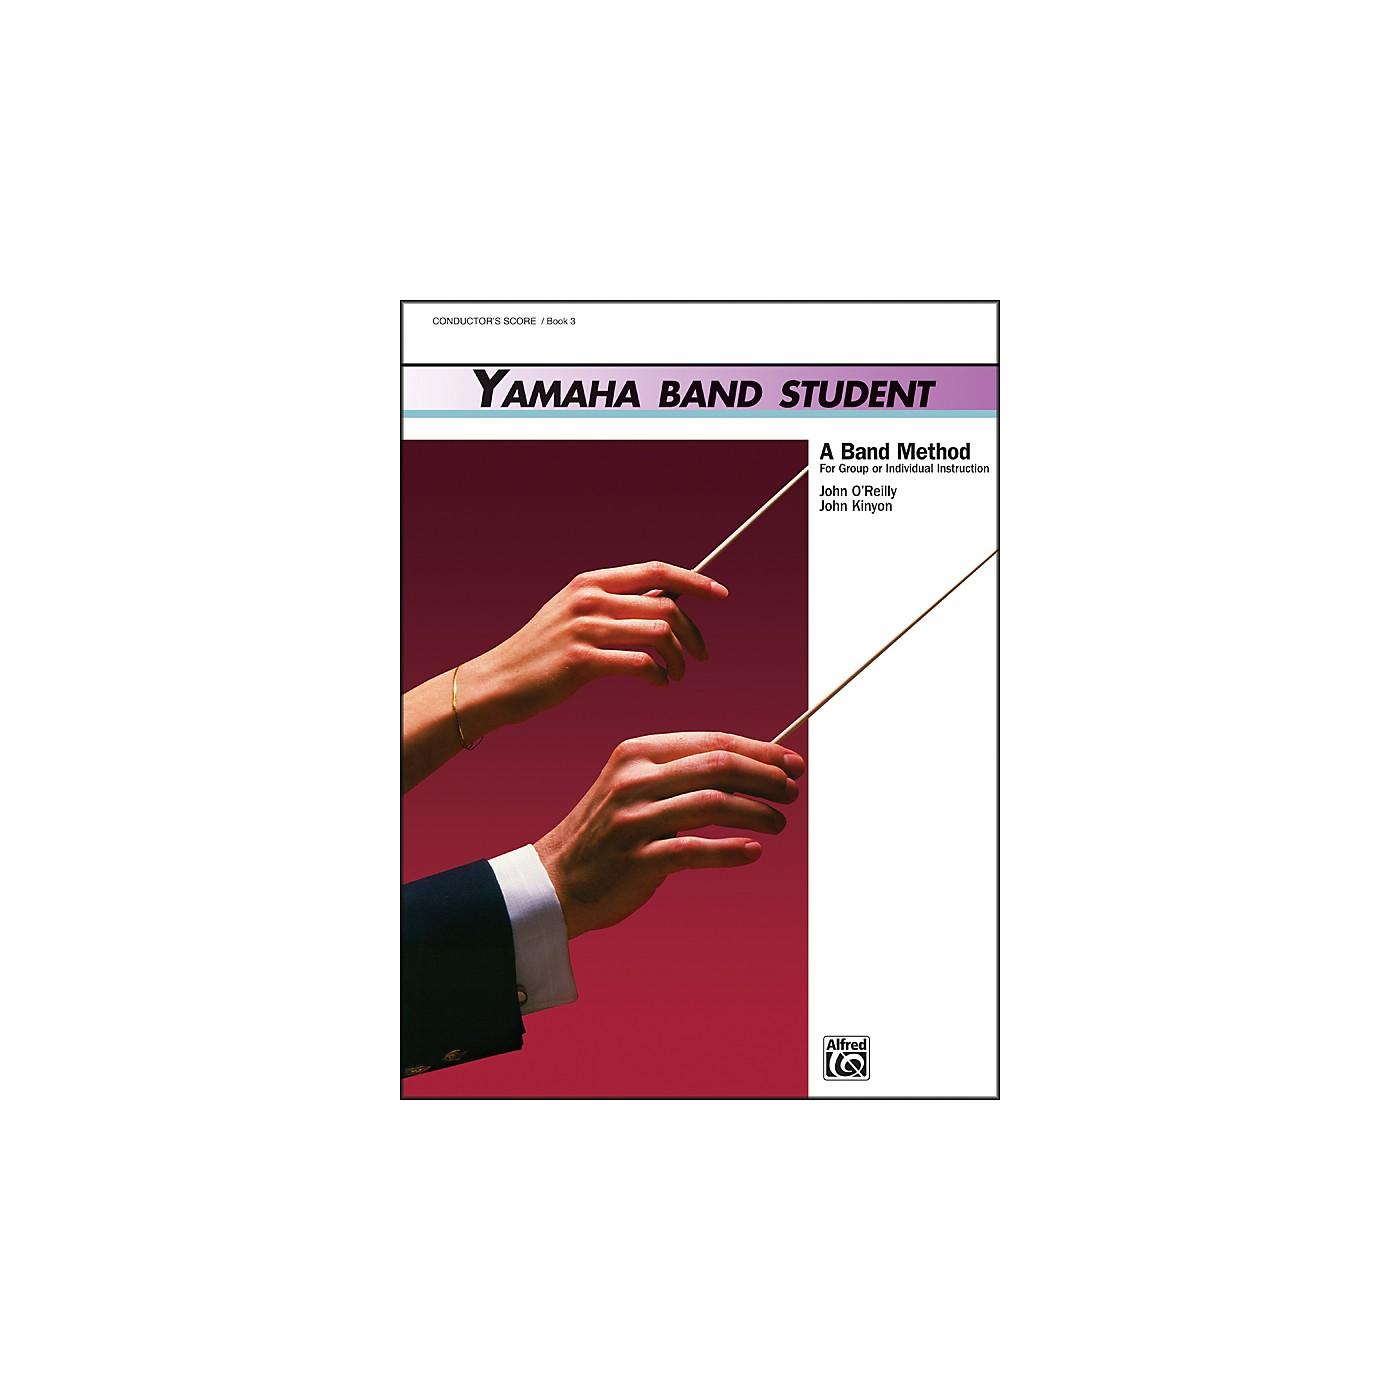 Alfred Yamaha Band Student Book 3 Conductor's Score thumbnail